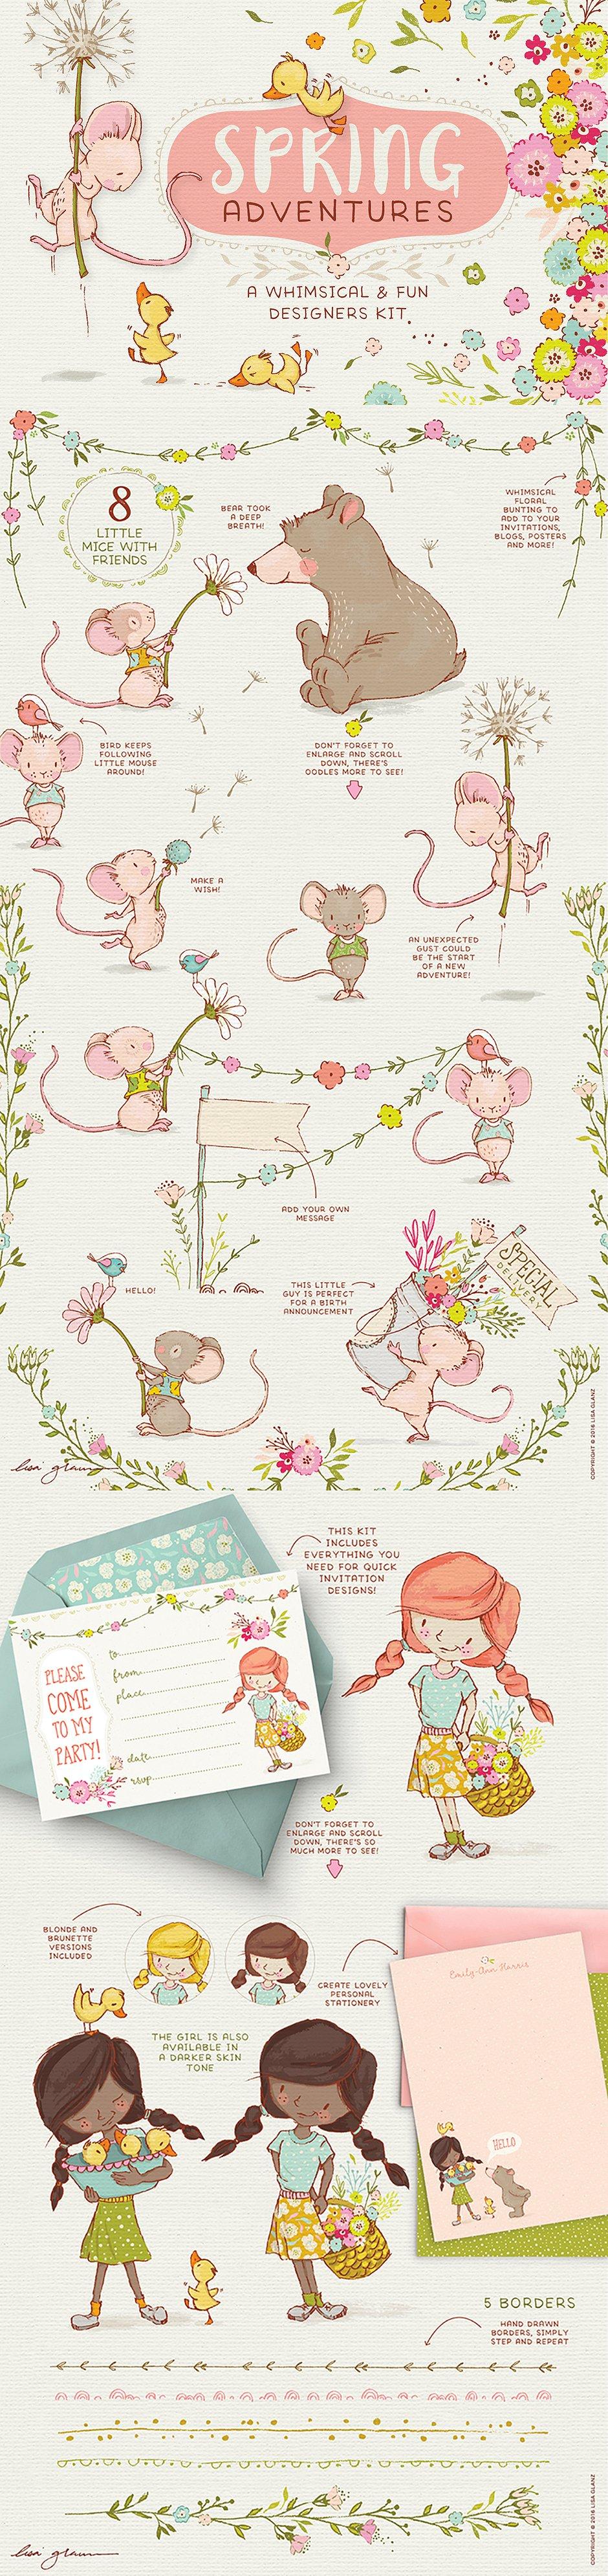 Spring Adventure Illustrations : Intro 32% Off